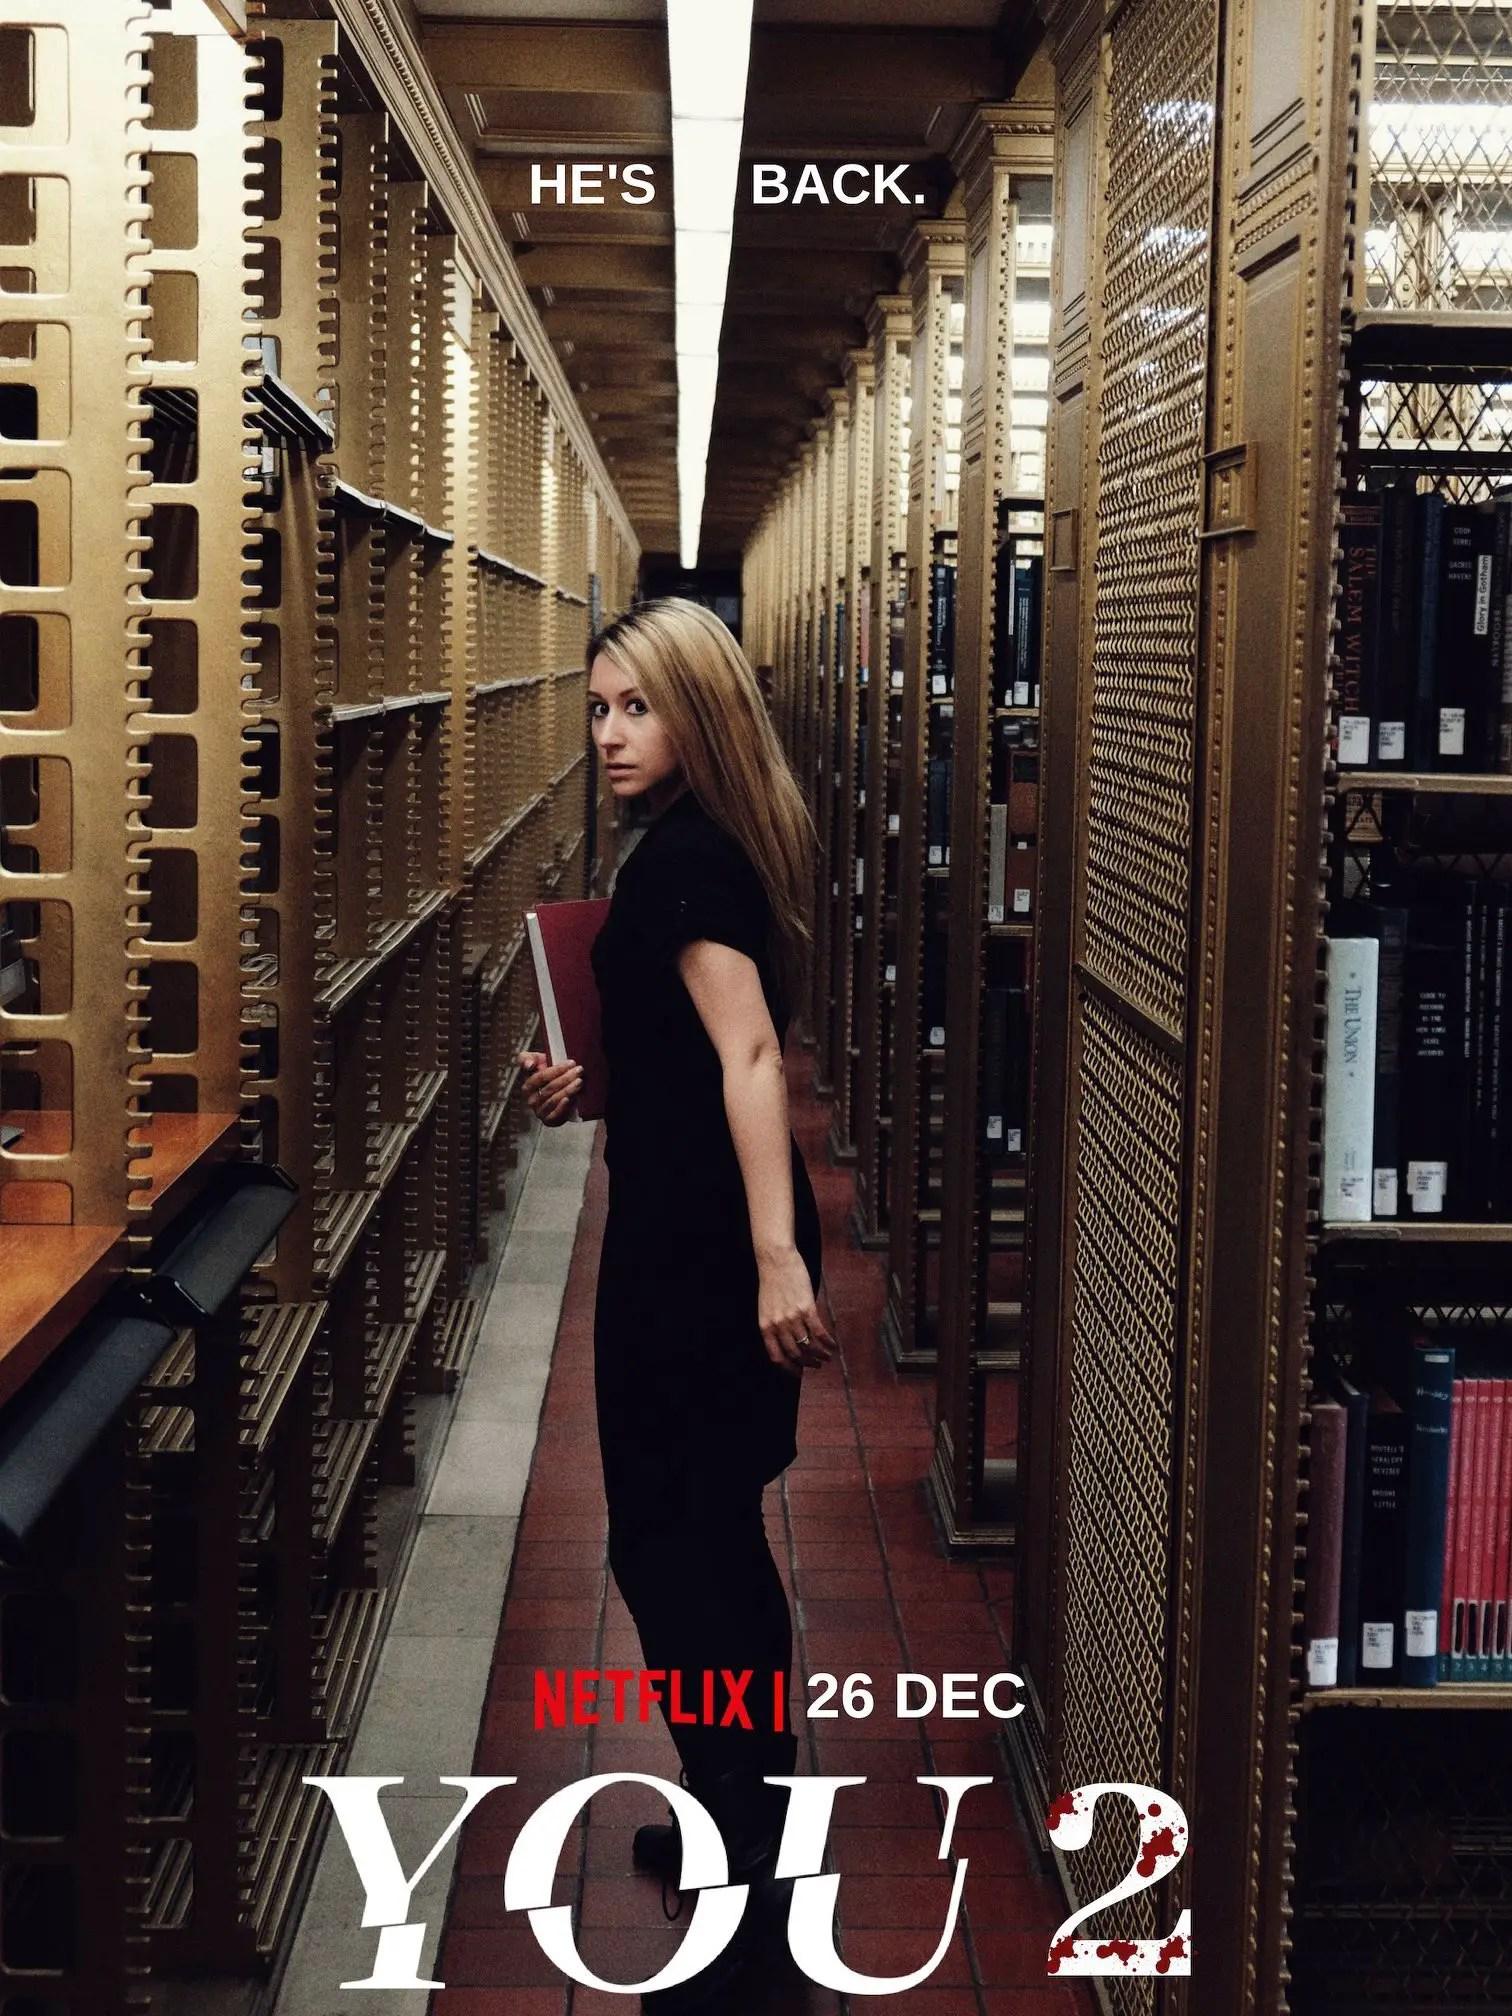 ¿Podremos ver la temporada 2 de YOU en Netflix en Diciembre?